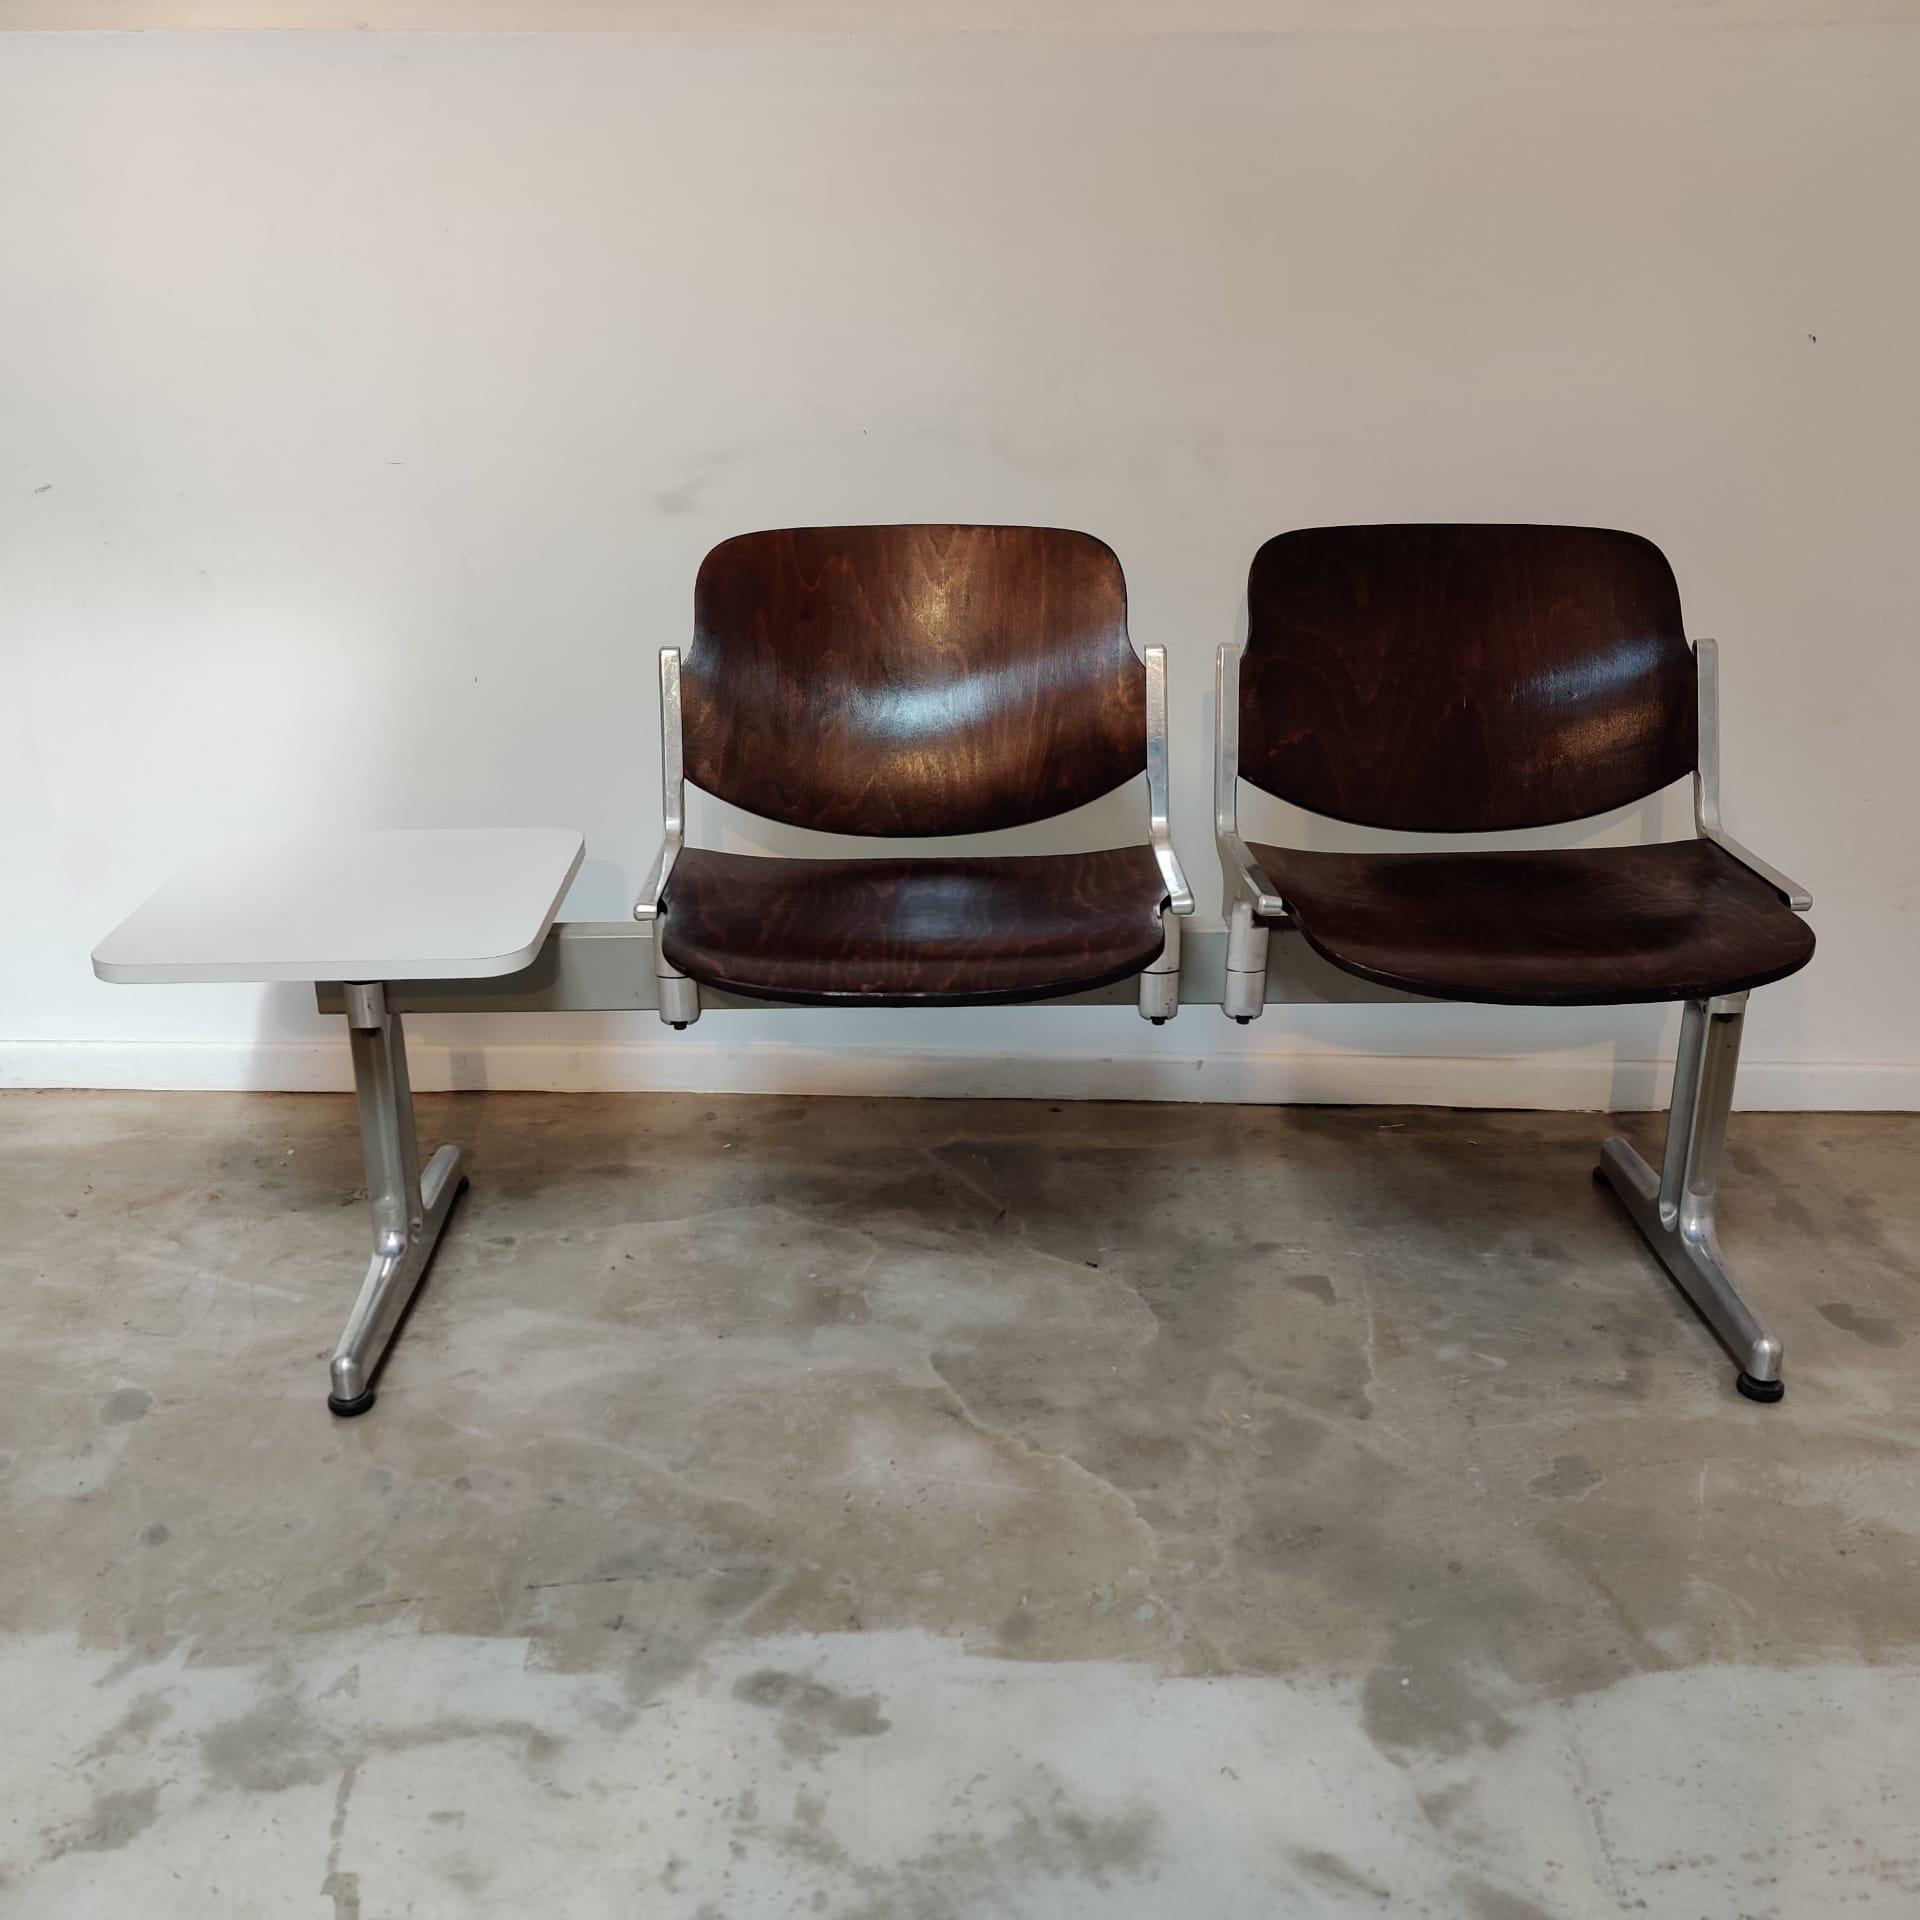 Italian Castelli bench